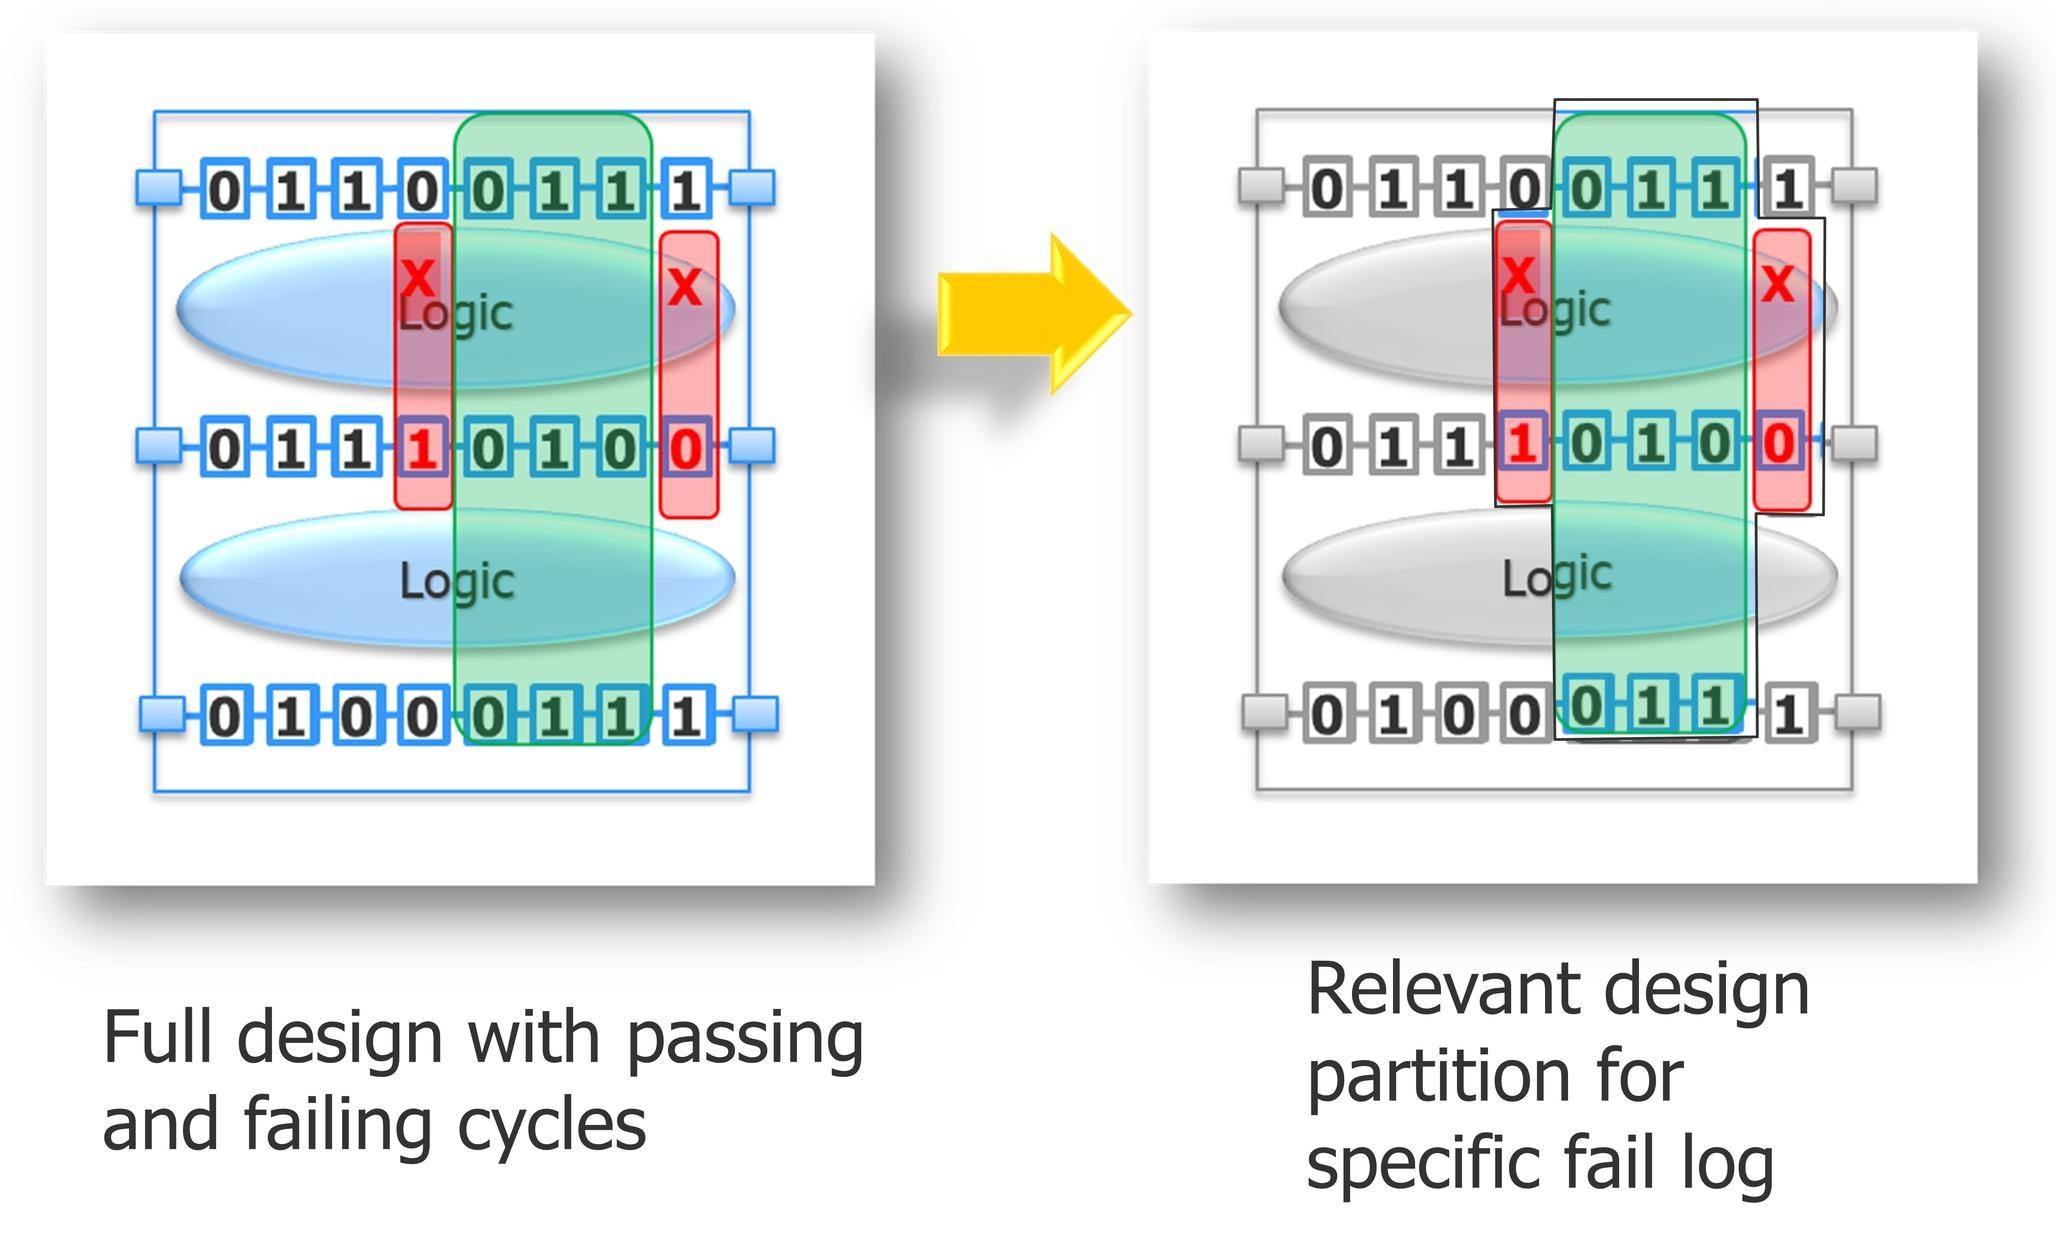 Improve Volume Scan Diagnosis Throughput 10X with Dynamic